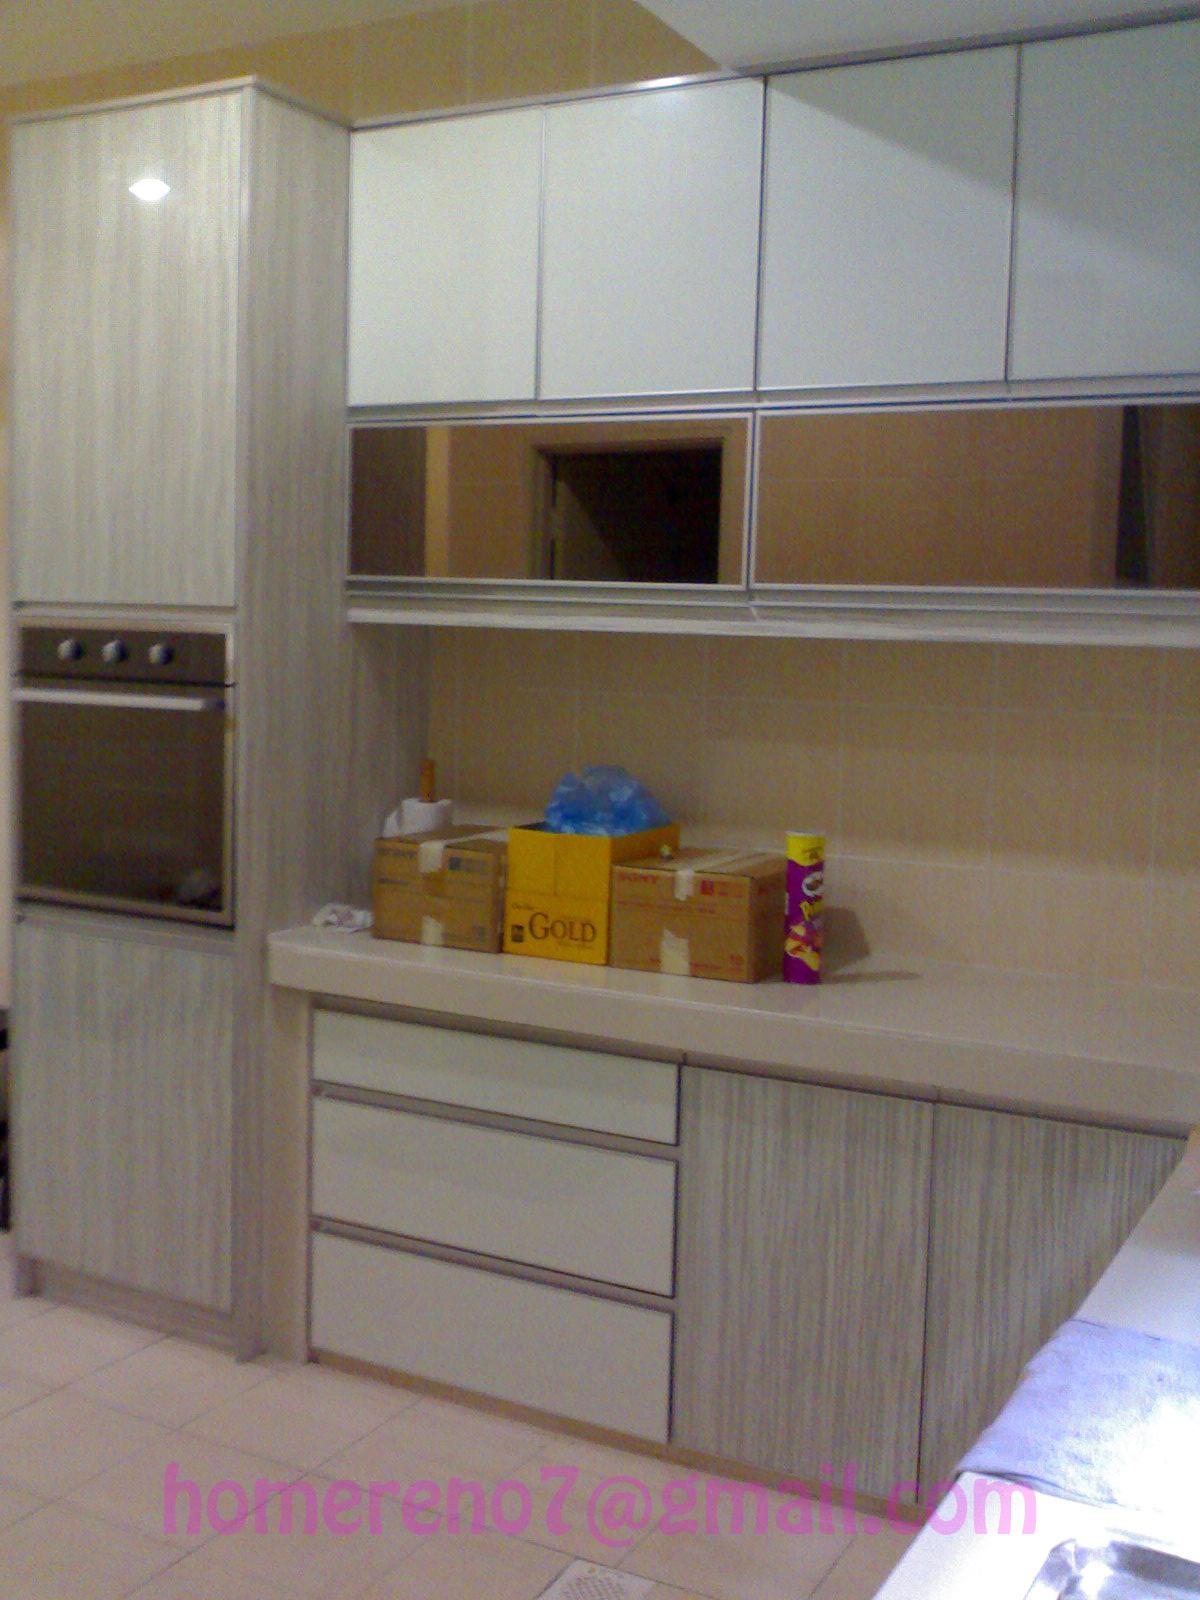 Kabinet Dapur | Plaster Siling-Grill-Gate-Kabinet Dapur Aluminium